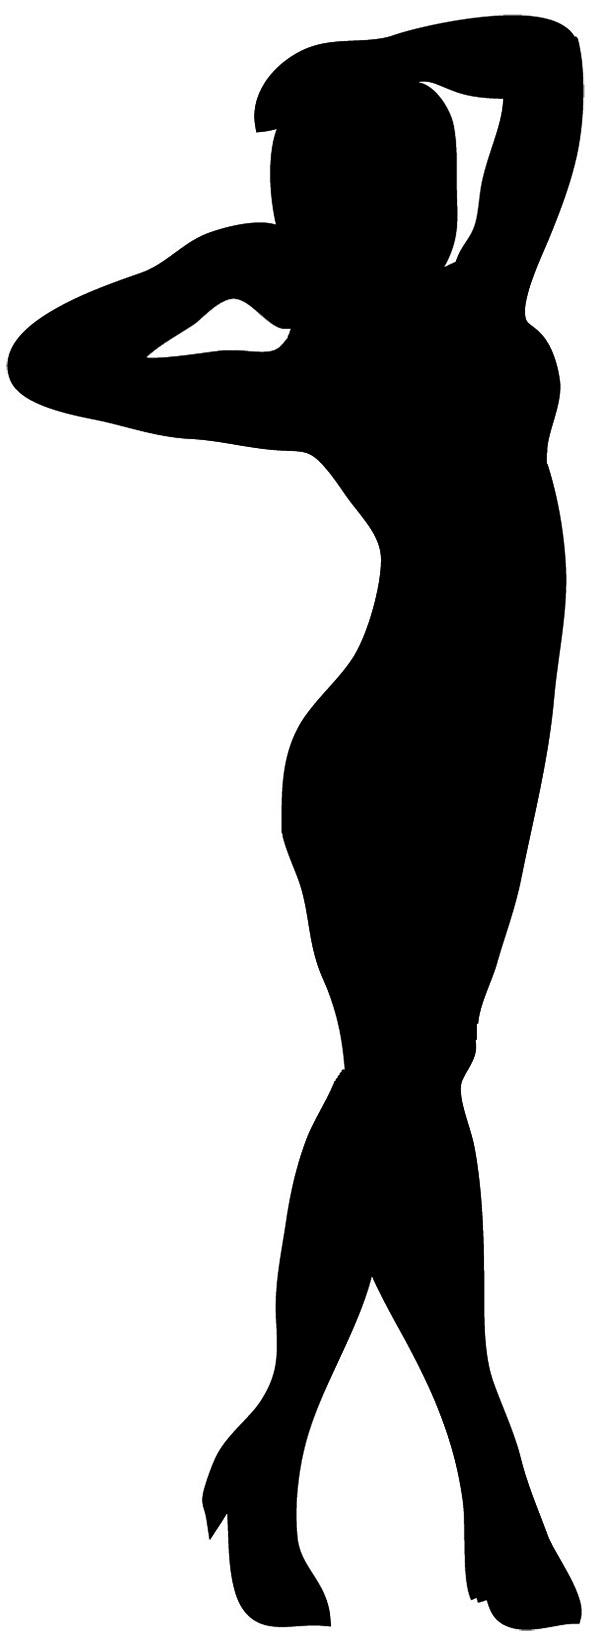 591x1632 Female Silhouette